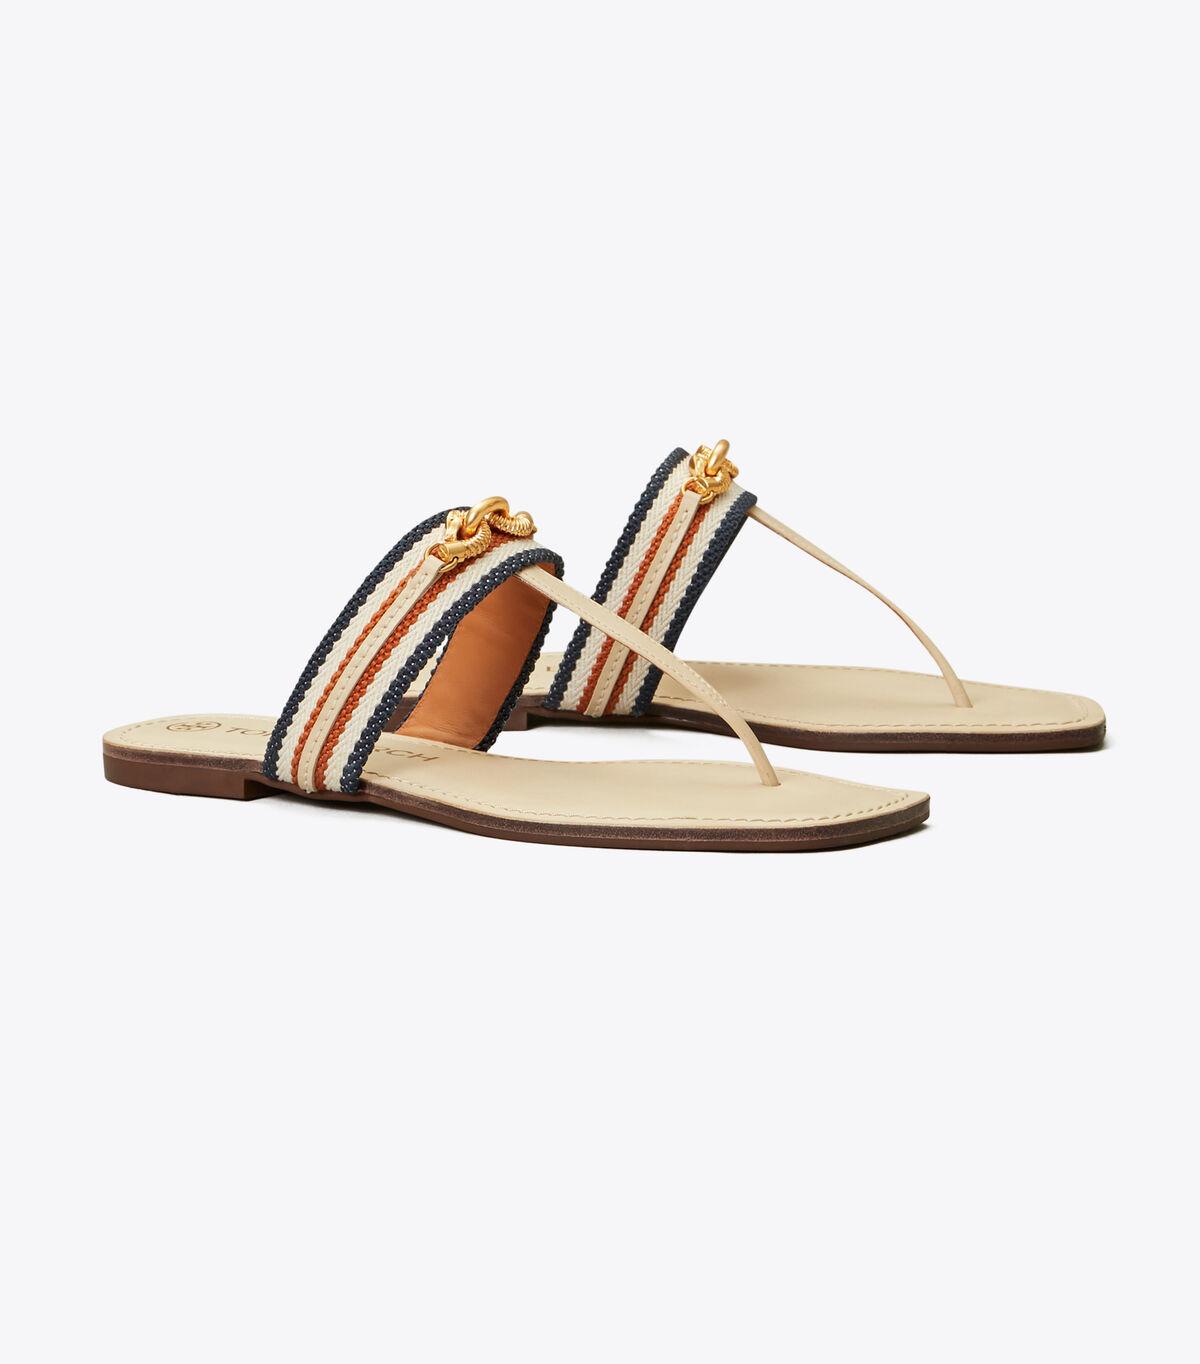 JESSA THONG SANDAL | 250 | Flat Sandals